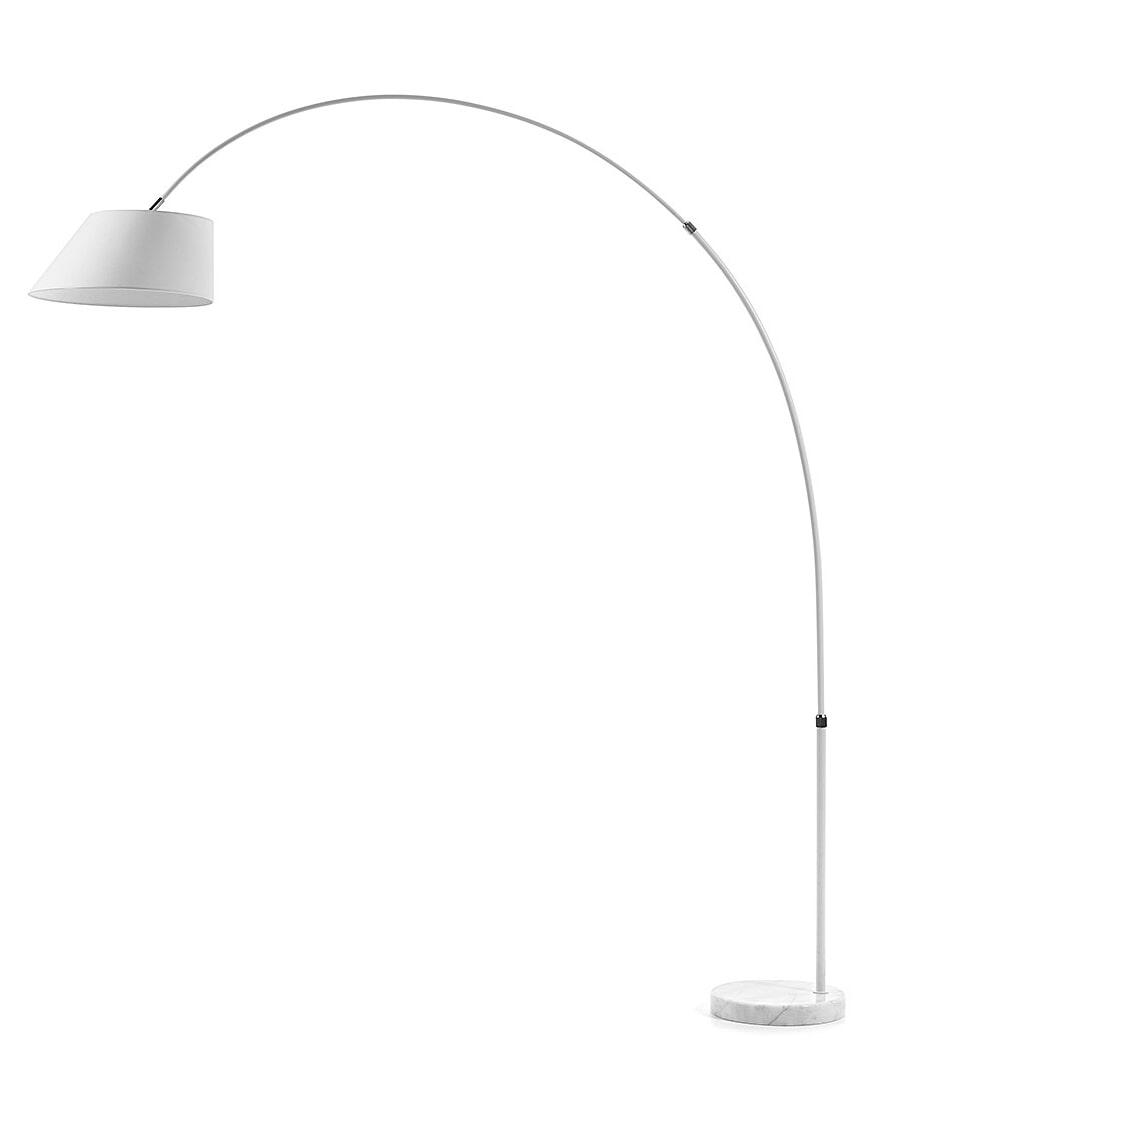 Kave Home Vloerlamp 'May', kleur wit